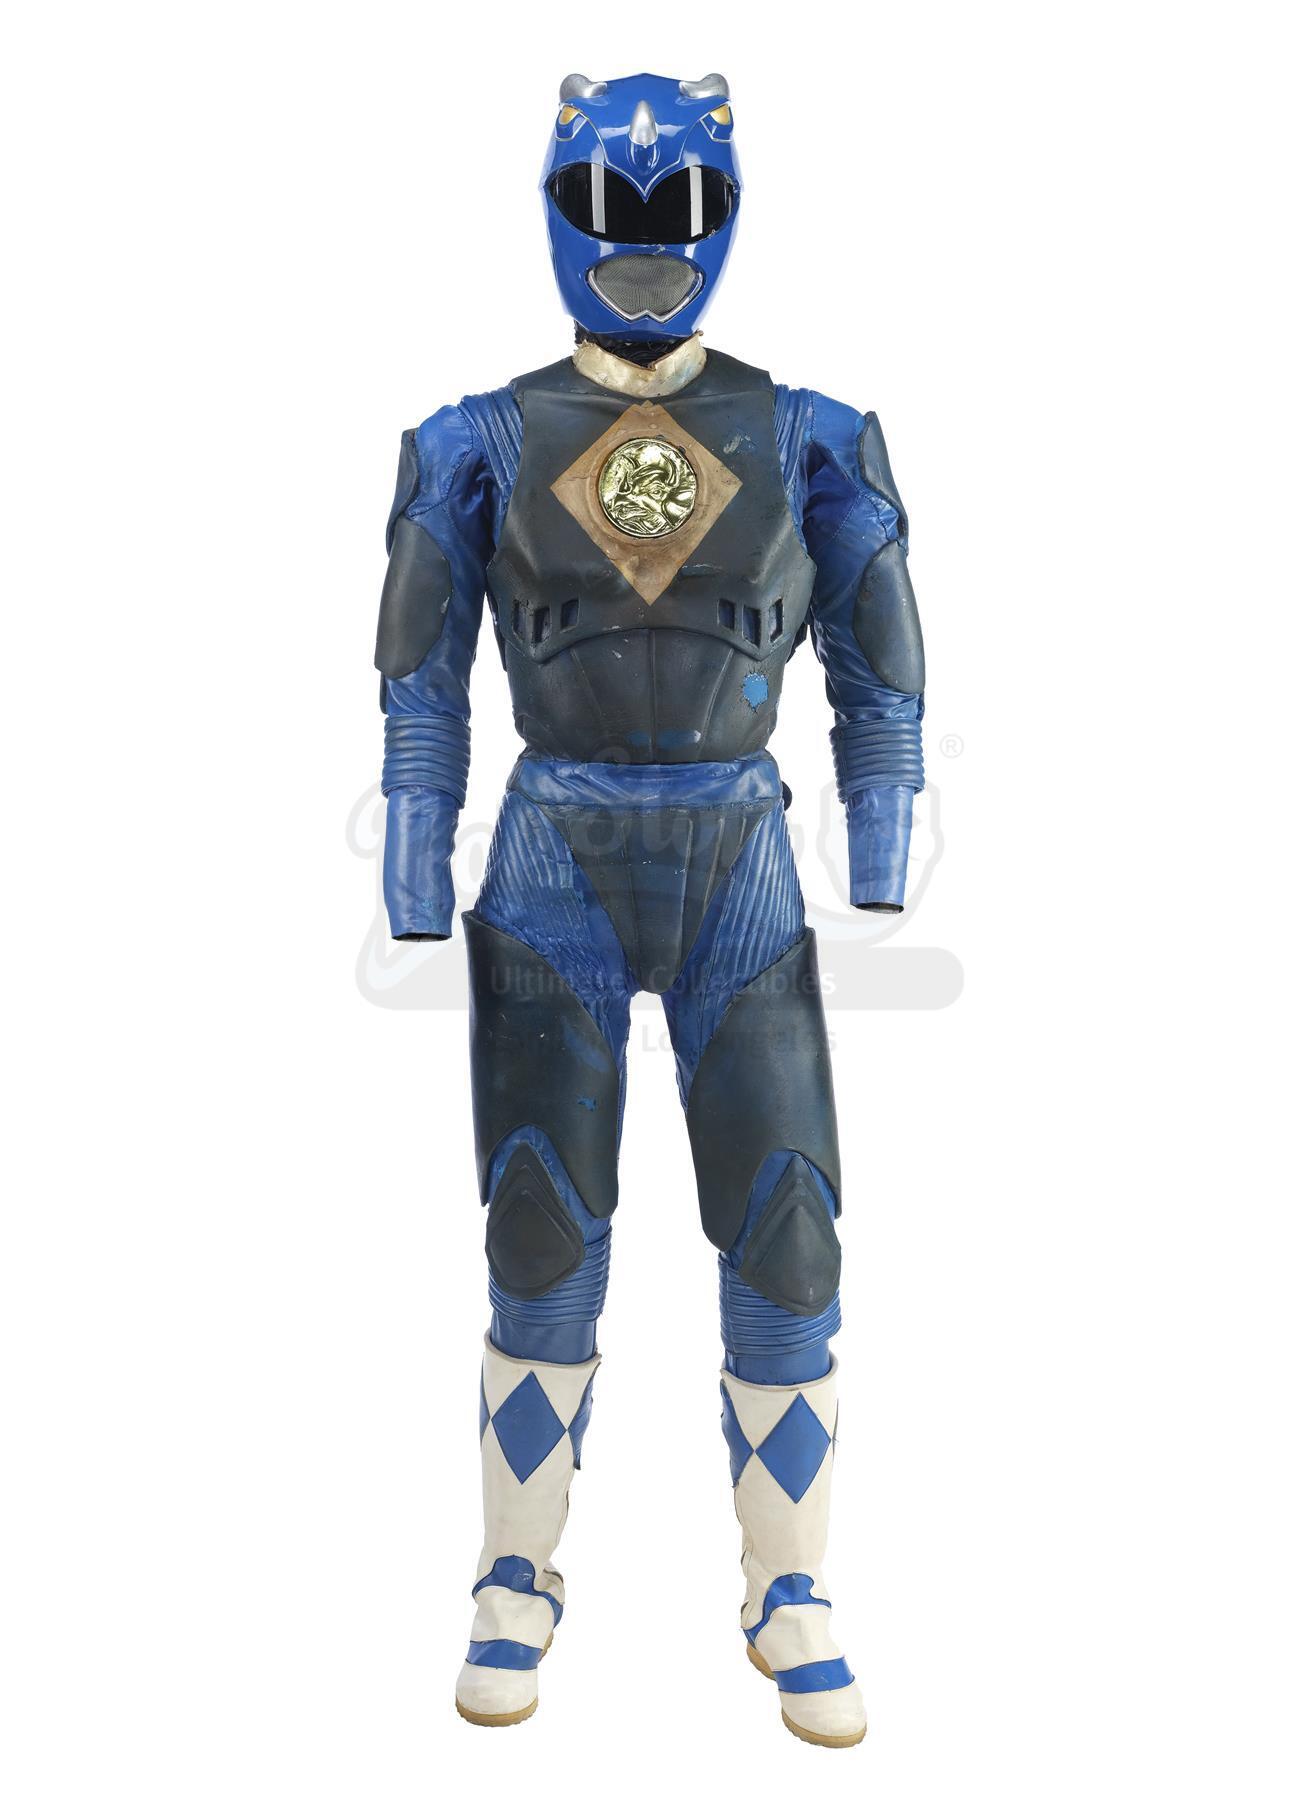 Lot # 186: MIGHTY MORPHIN' POWER RANGERS: THE MOVIE - Blue Ranger (David Yost) Costume